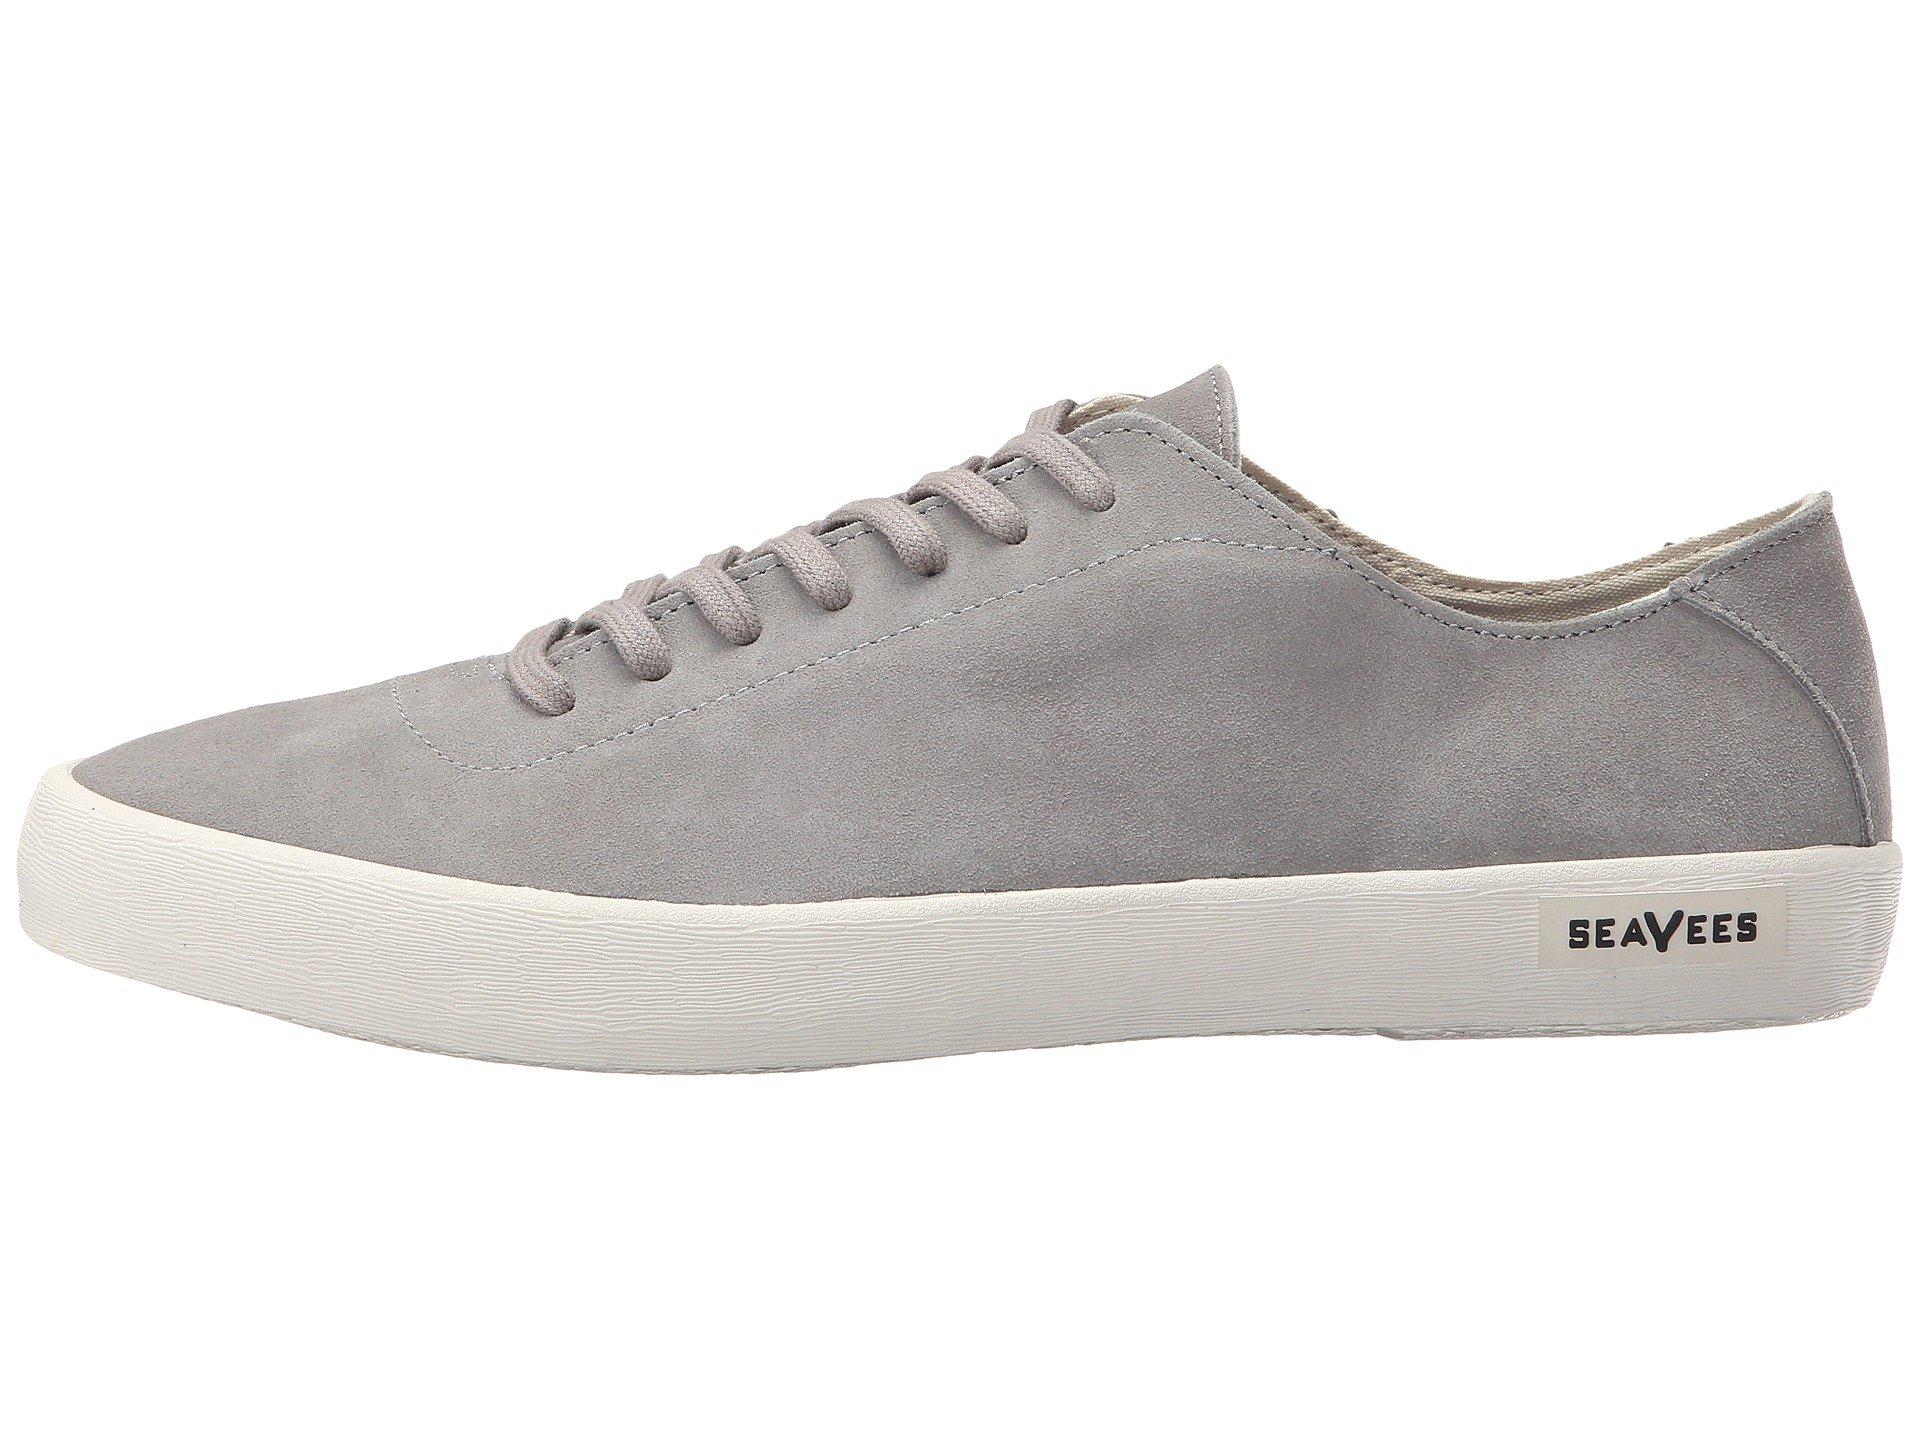 Sneaker Seavees 60 Steel Club 09 Racquet PPIqY